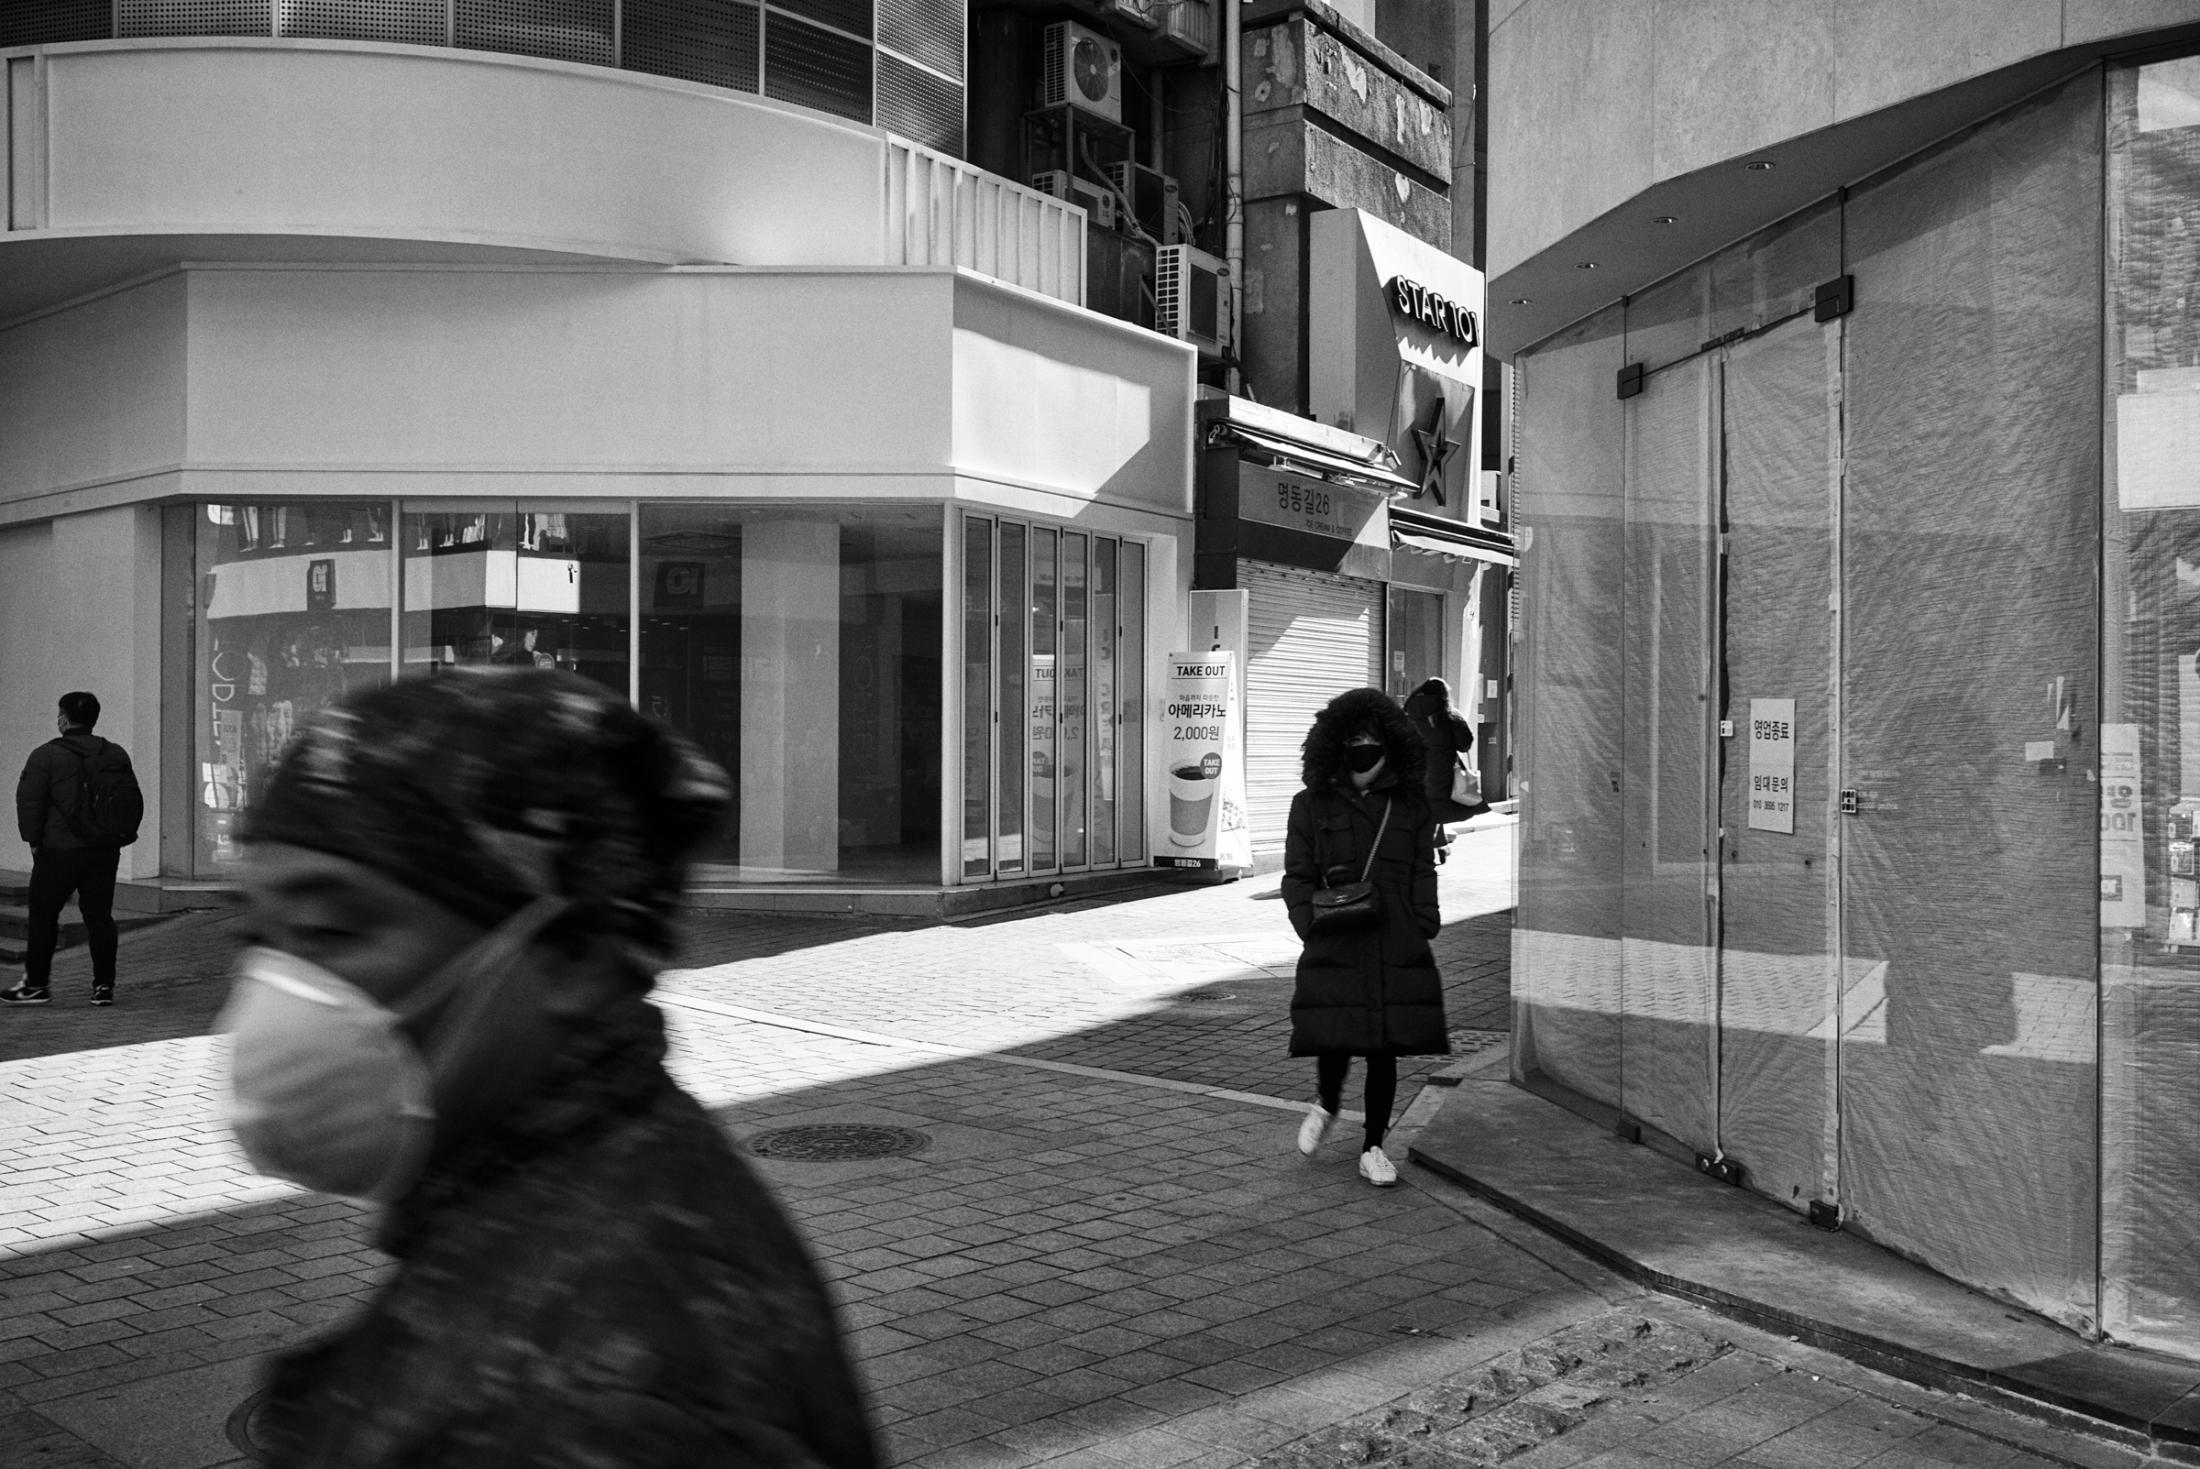 Myungdong, 11:52 a.m. Sunday. Jan. 17, 2021. Seoul, South Korea. 명동, 서울. 2021년 1월 17일 일요일 오전 11시 52분.